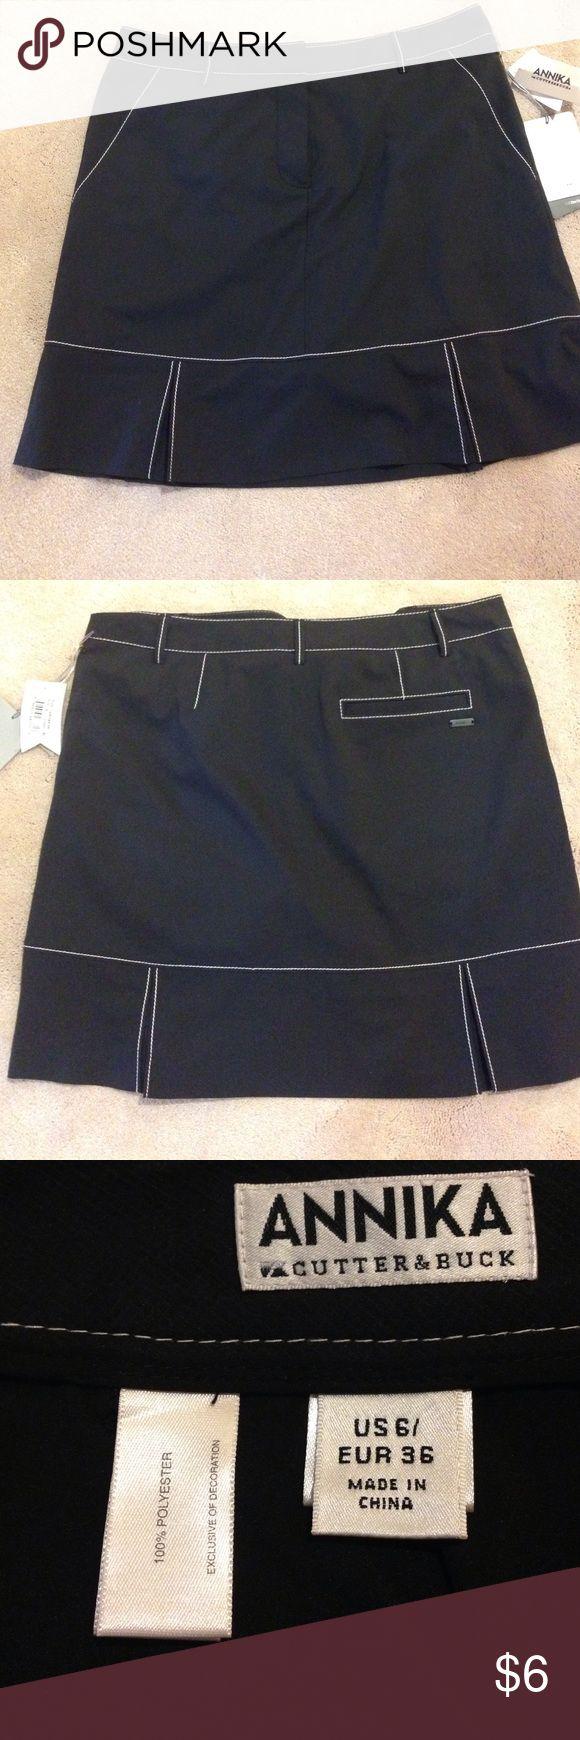 Golf skirt This black golf skirt has never been worn. Annika Skirts Mini